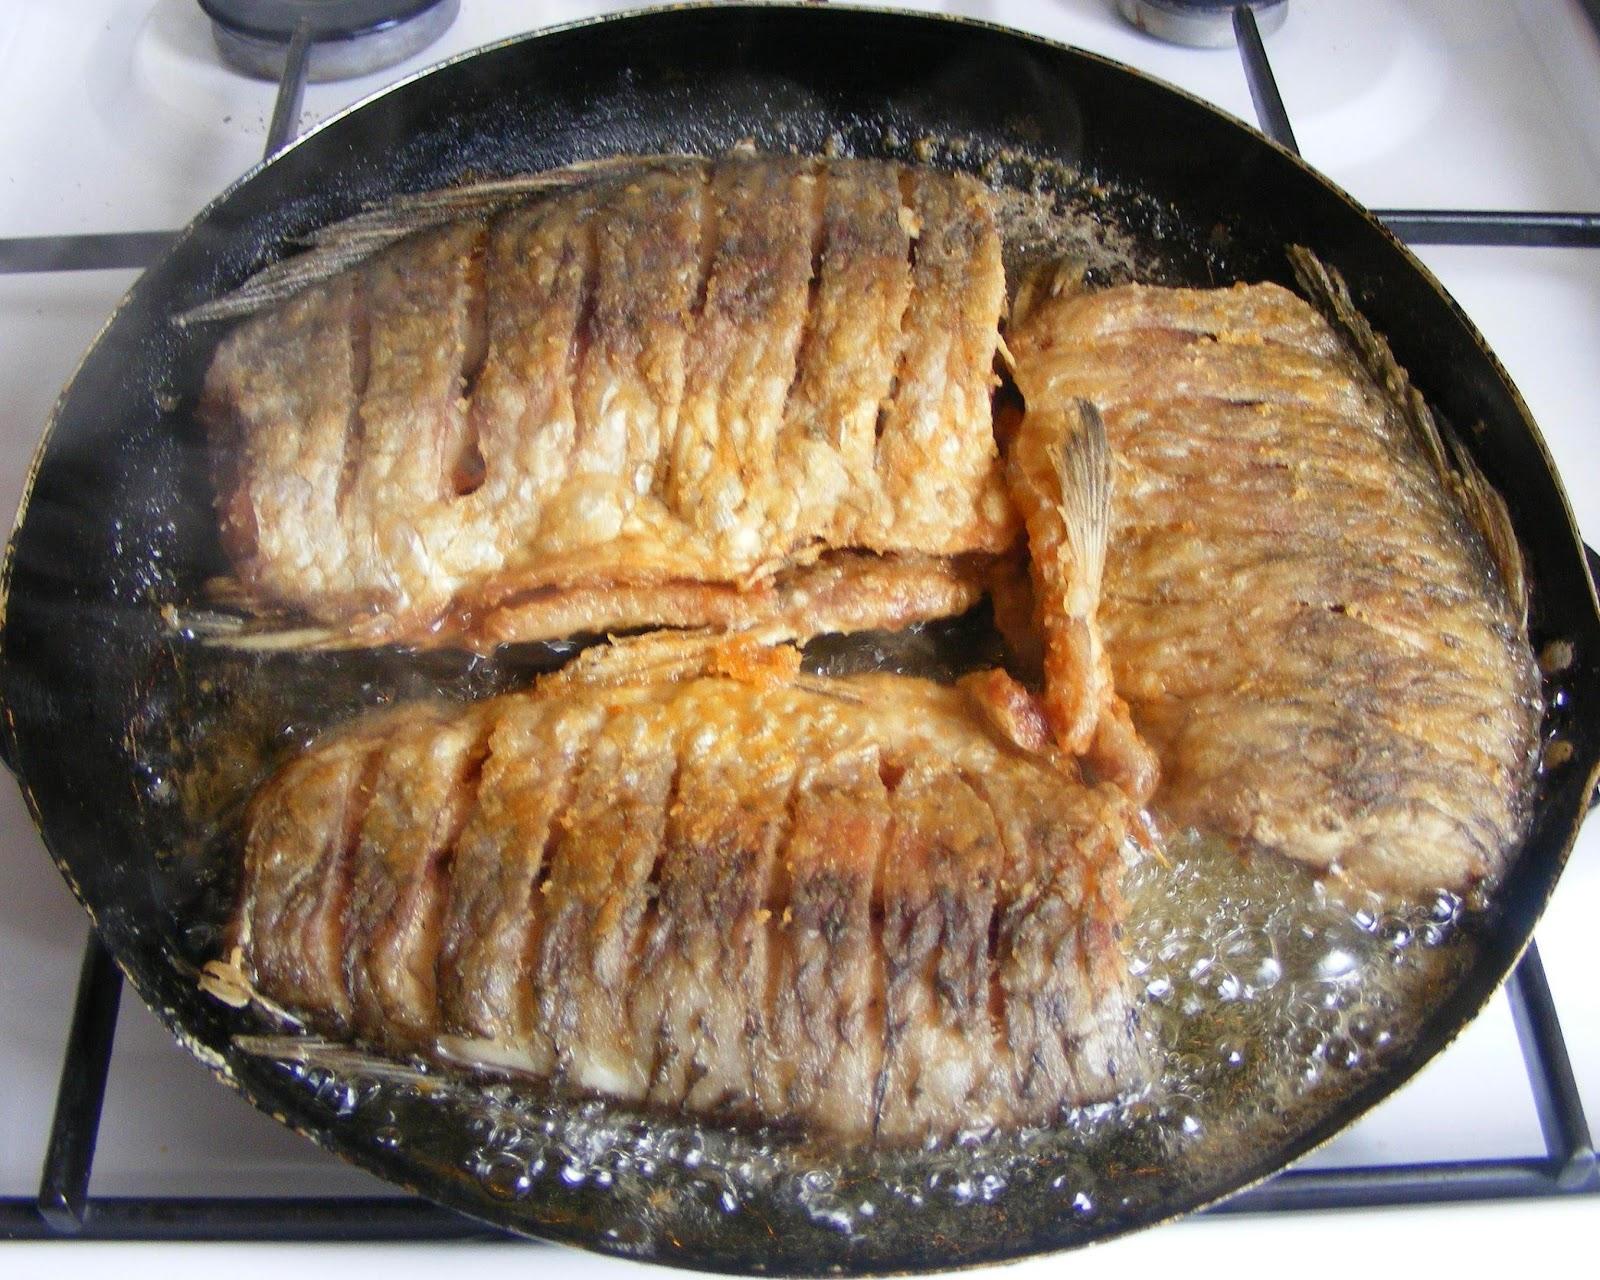 peste prajit, caras prajit, peste caras prajit, peste prajit cu mujdei de usturoi, peste caras prajit, retete si preparate culinare peste caras prajit cu mujdei de usturoi, retete cu peste, reteta cu peste, retete de mancare,